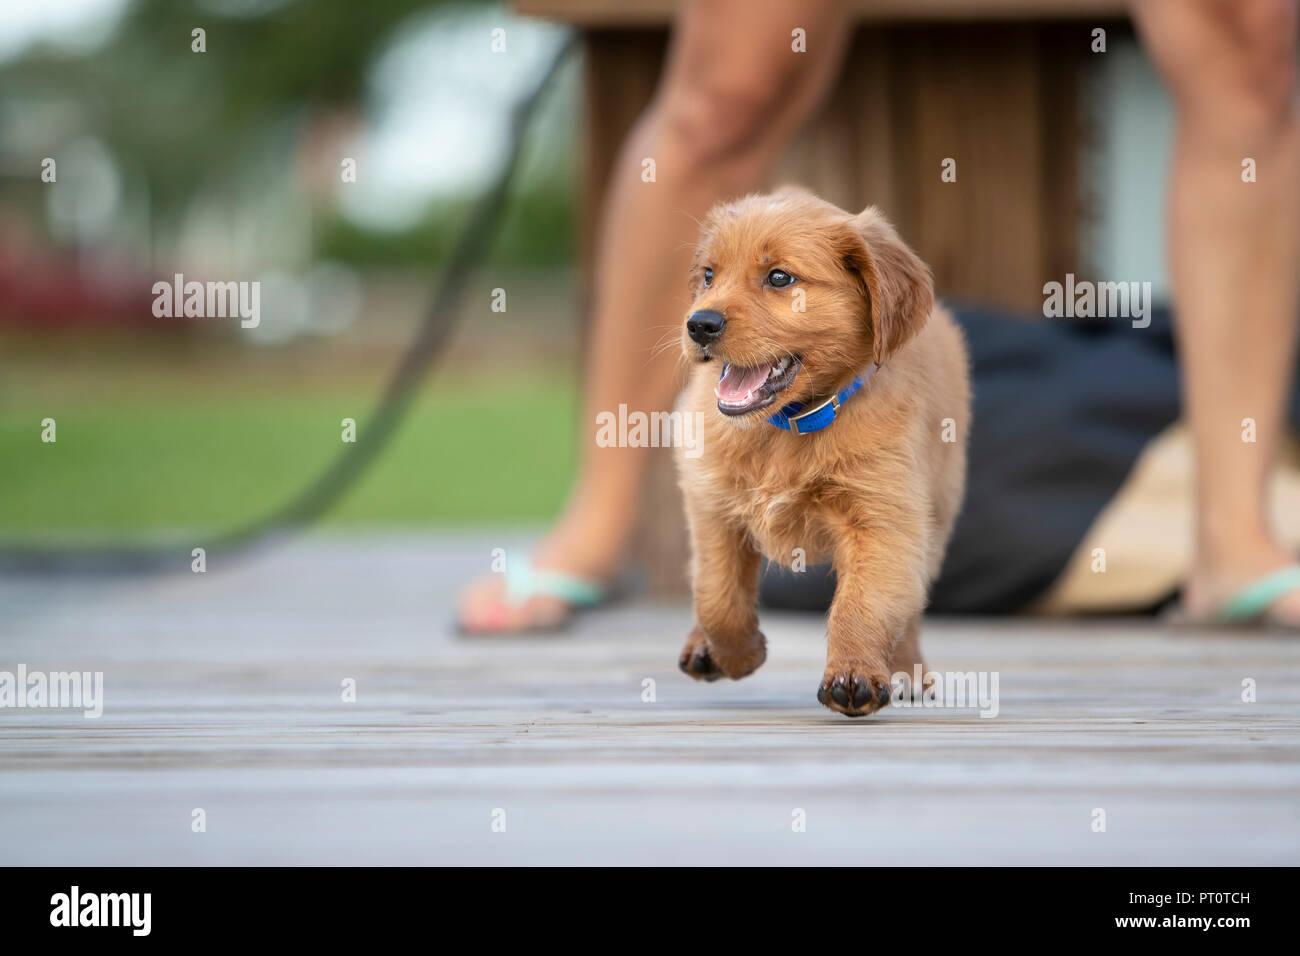 Puppy Energy Stock Photos & Puppy Energy Stock Images - Alamy